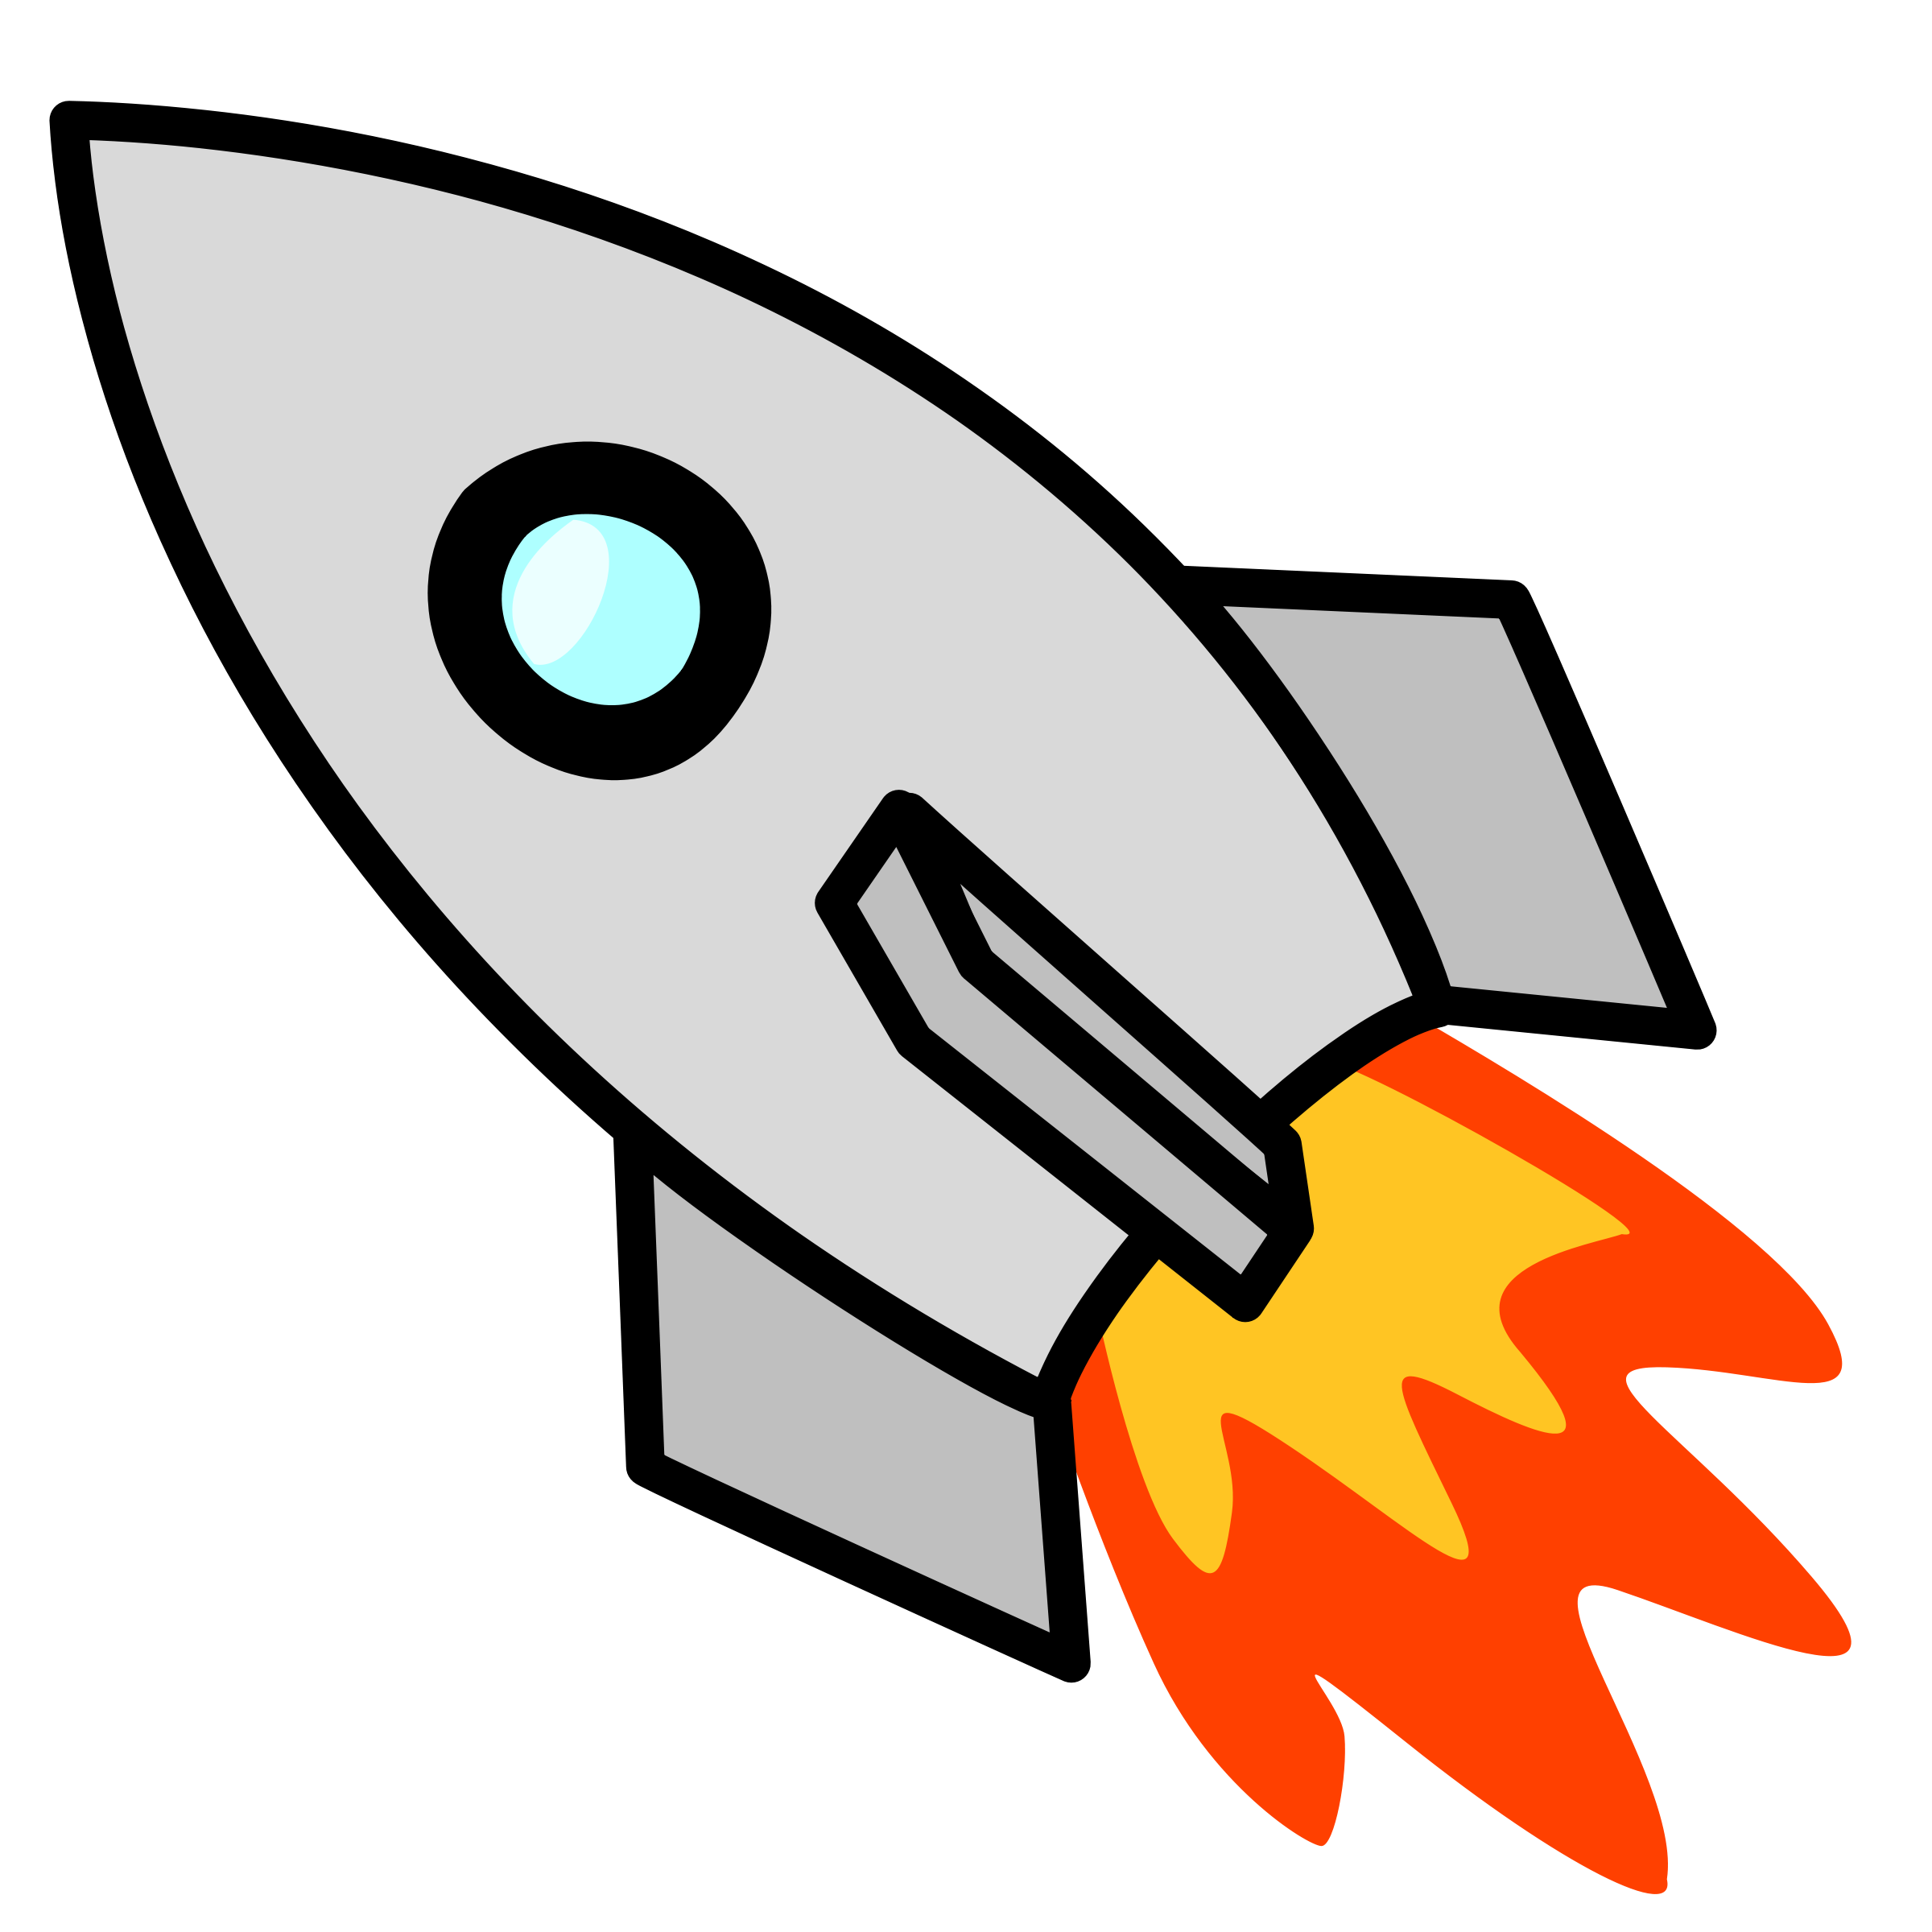 PNG HD Of Rockets - 123682